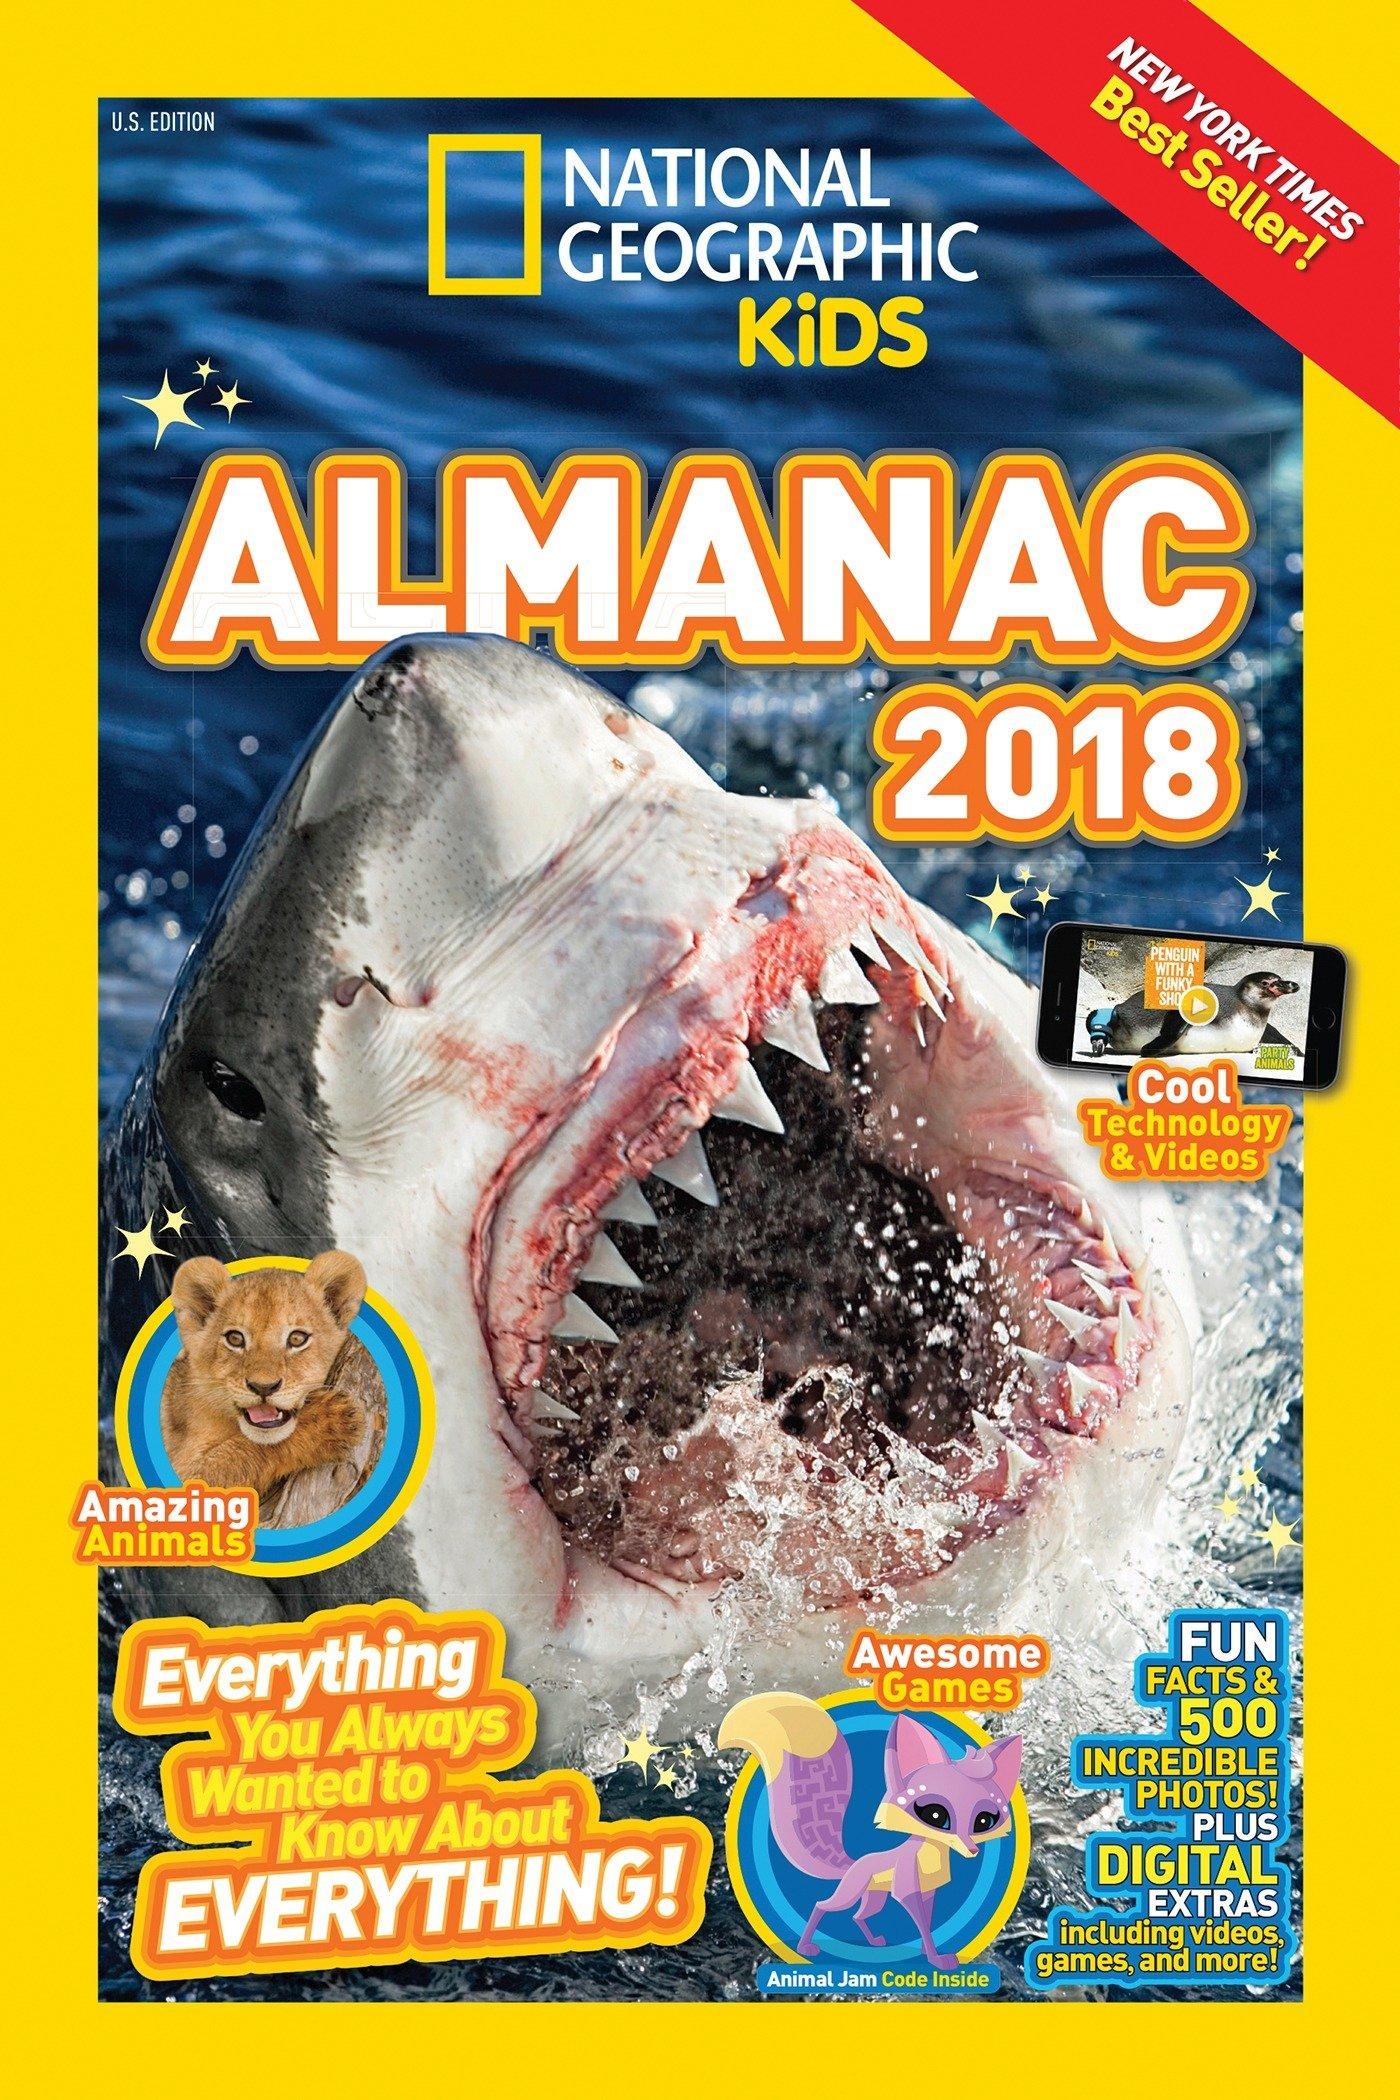 National Geographic Kids Almanac 2018 (National Geographic Almanacs) by NATIONAL GEOGRAPHIC CHILDRENS